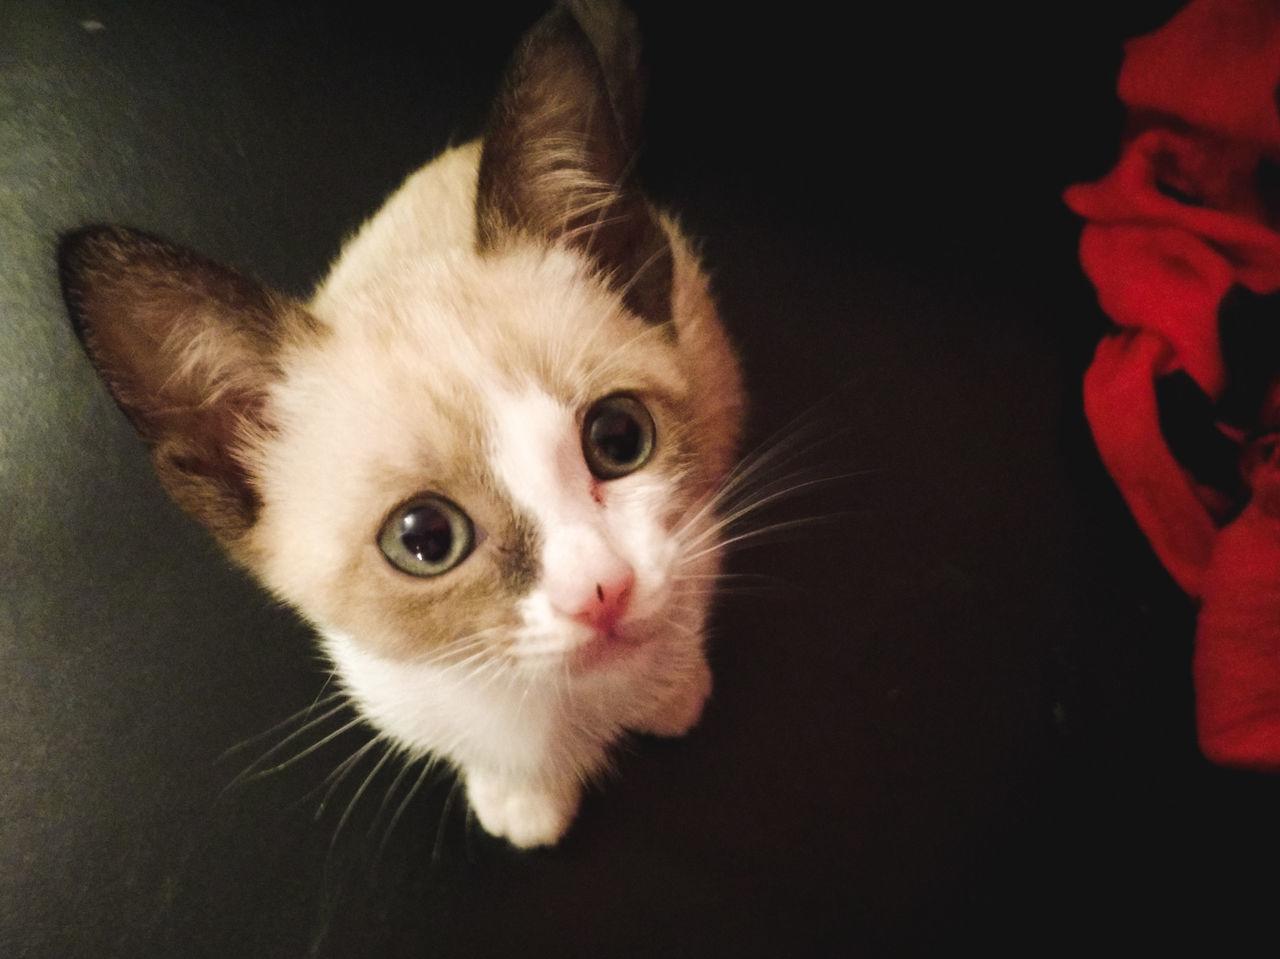 Se ele quisesse algo, só os sem coração negariam... Animal Themes Babycat Cat Close-up Domestic Animals Domestic Cat Feline Indoors  Kitten Looking At Camera Mammal No People One Animal Pets Portrait